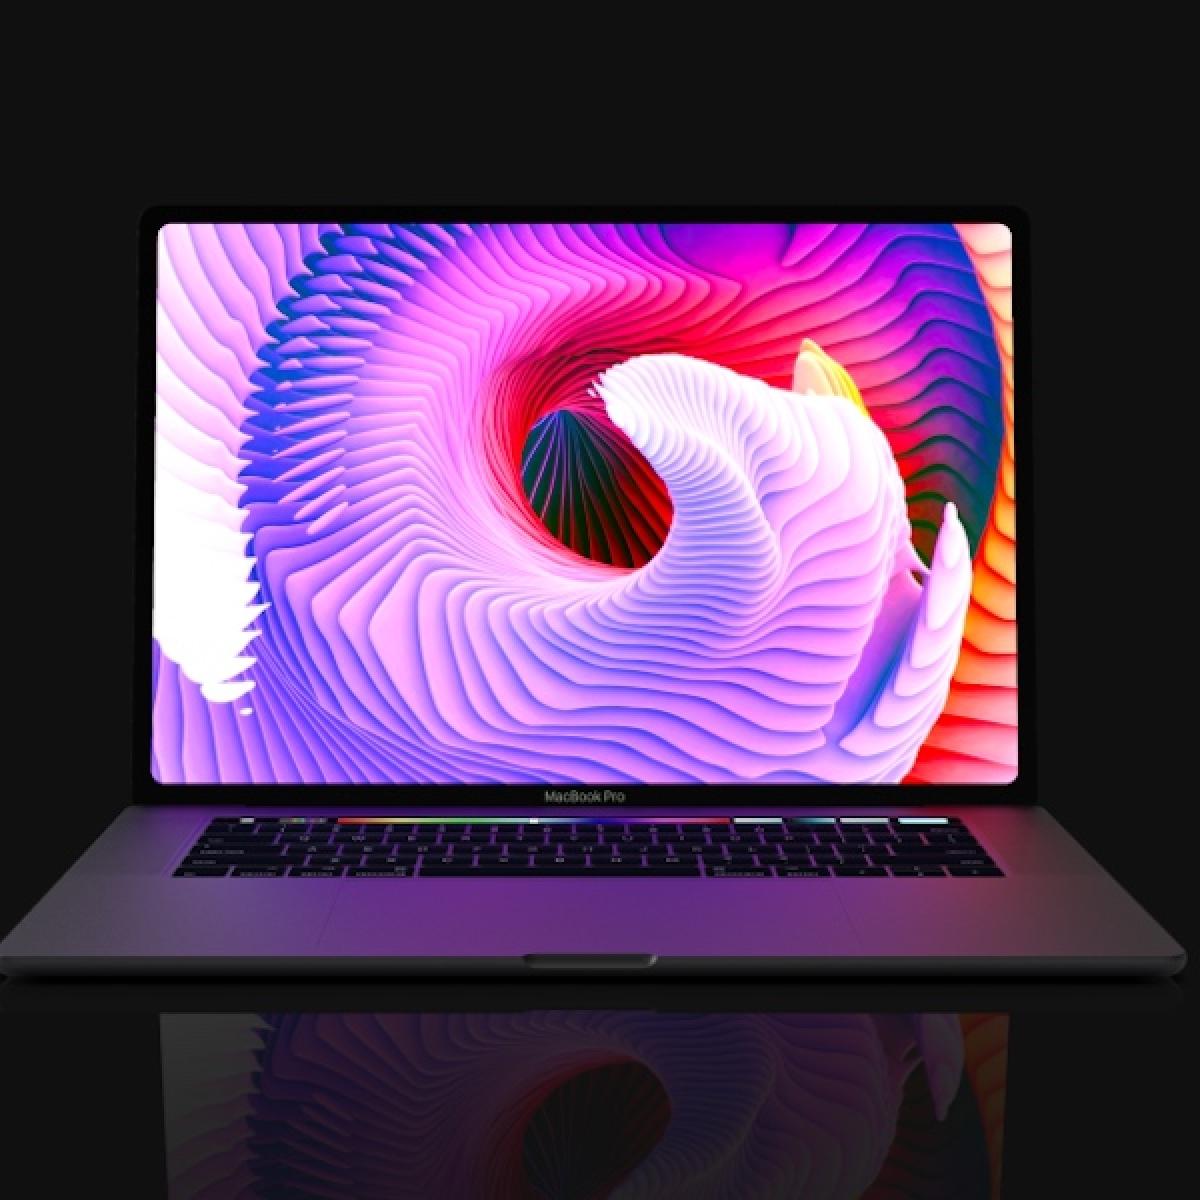 Apple gets regulatory nod for MacBook with Magic keyboard